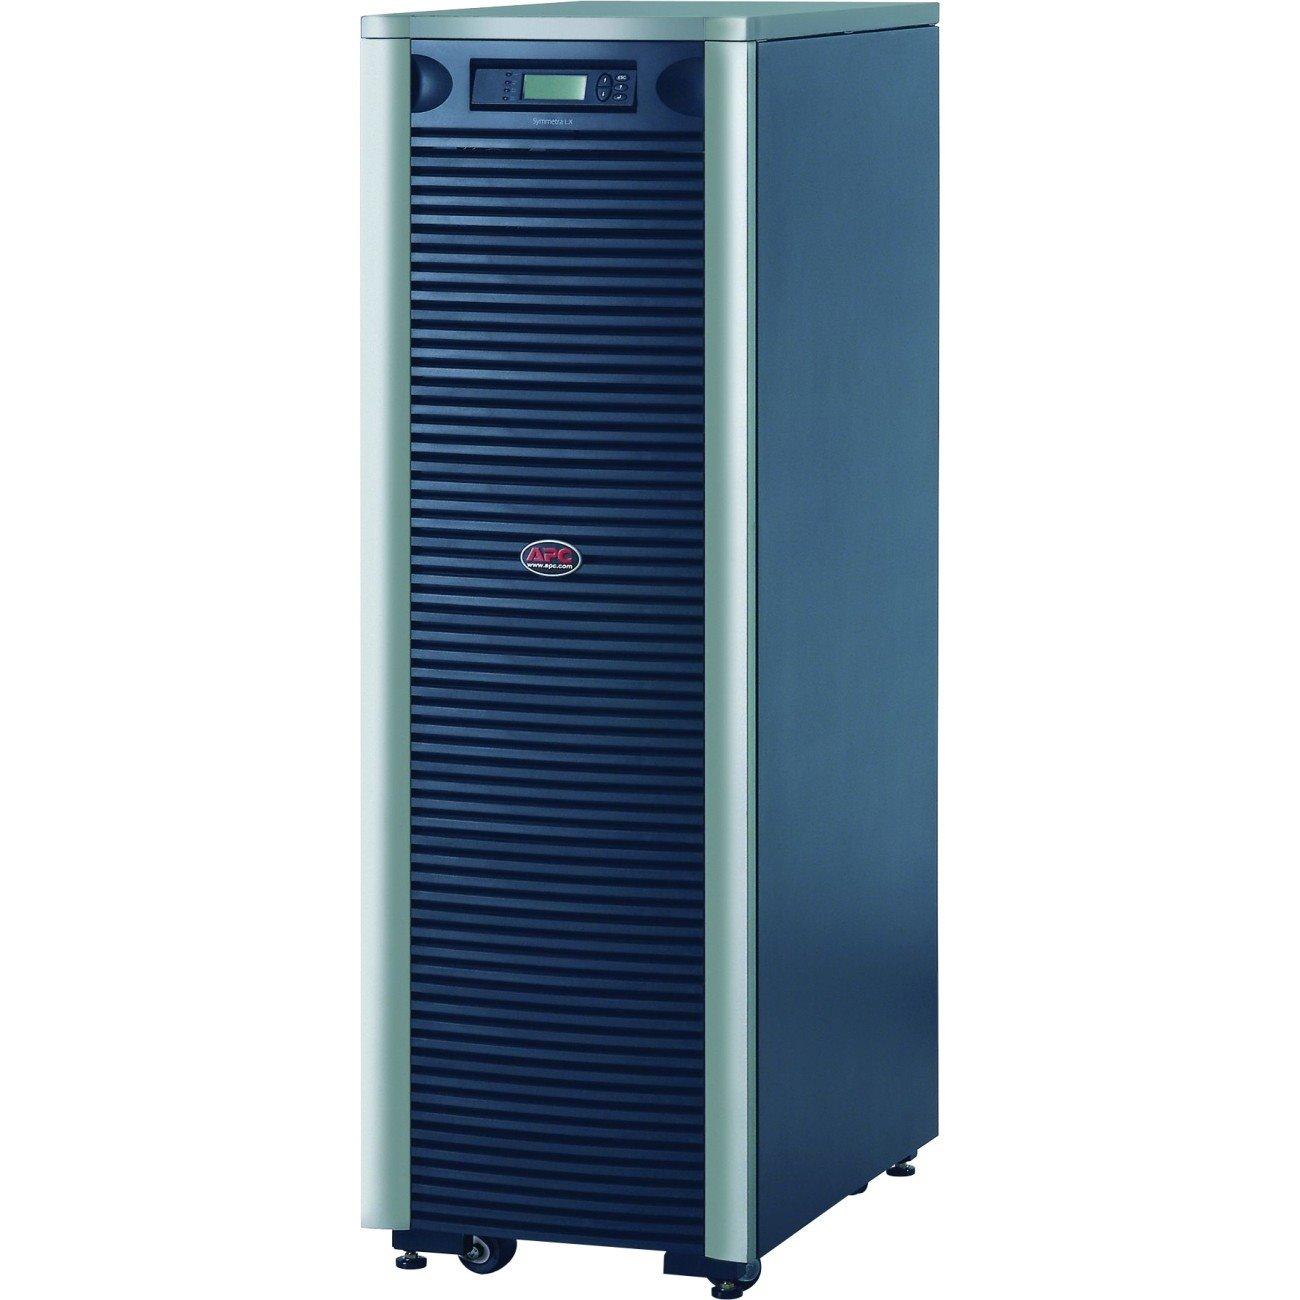 APC by Schneider Electric Symmetra SYA12K16IXR Dual Conversion Online UPS - 12 kVA/8.40 kW